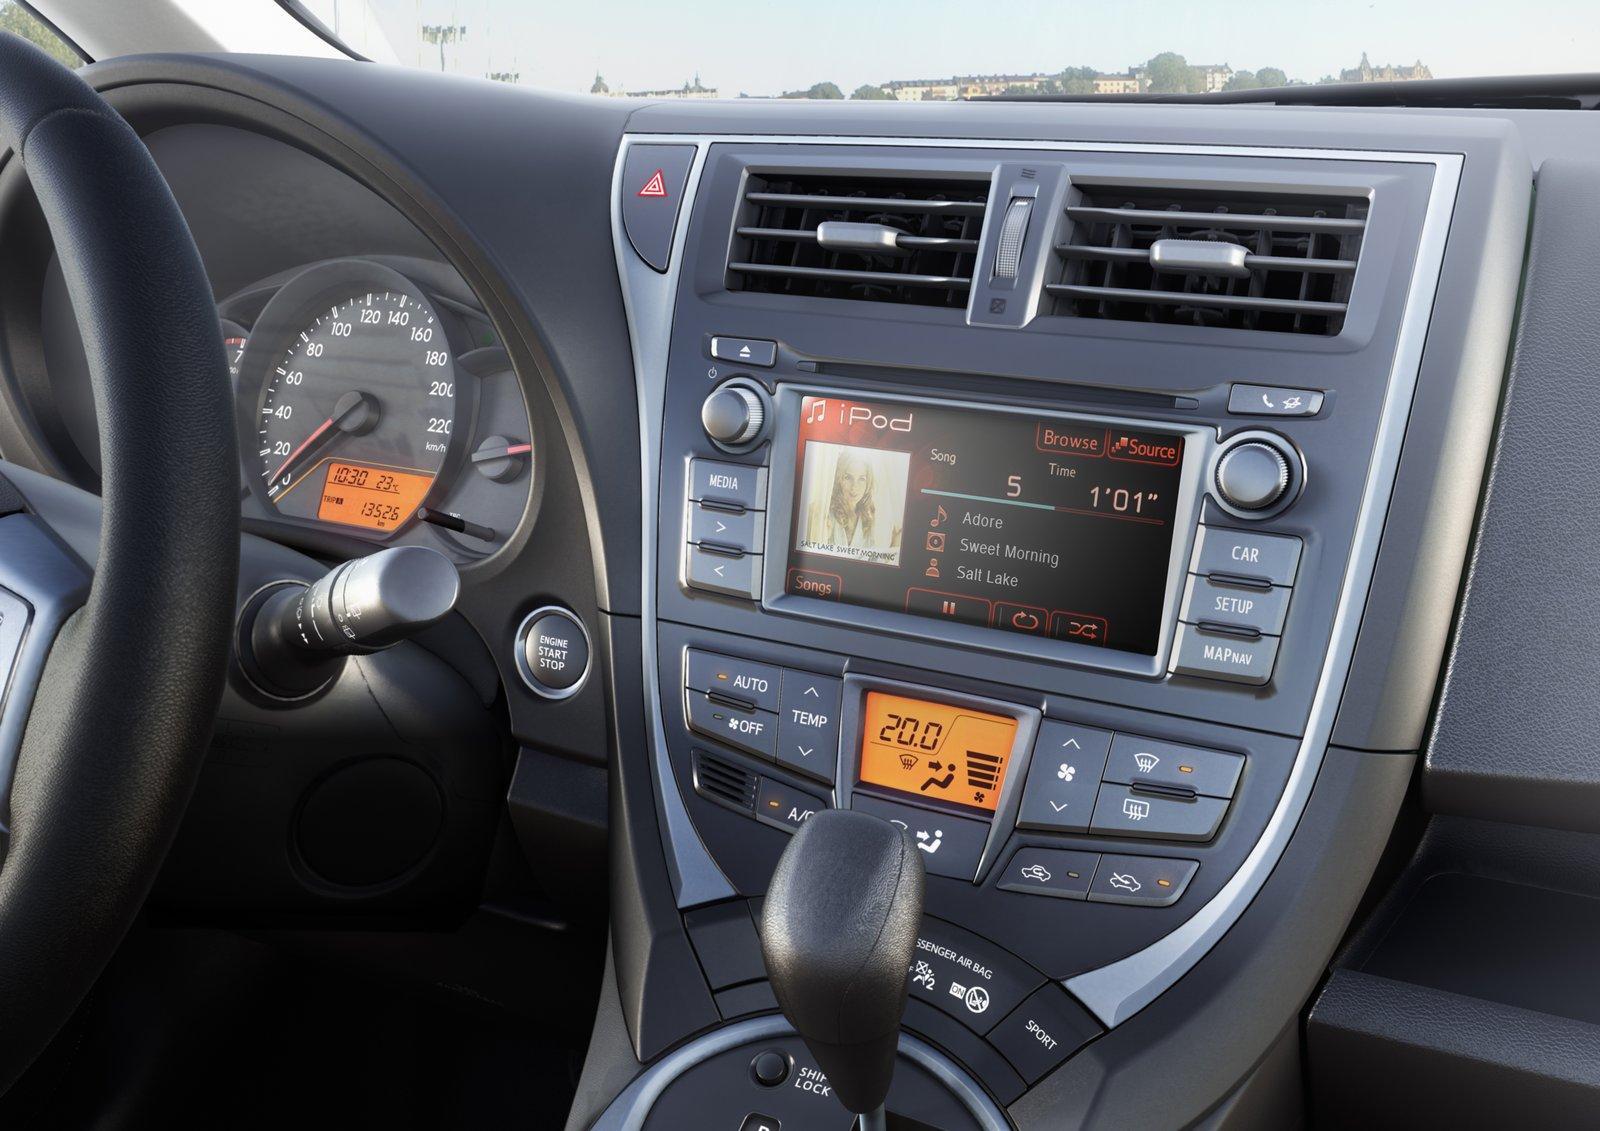 2011 Toyota Verso S 2015 Interior